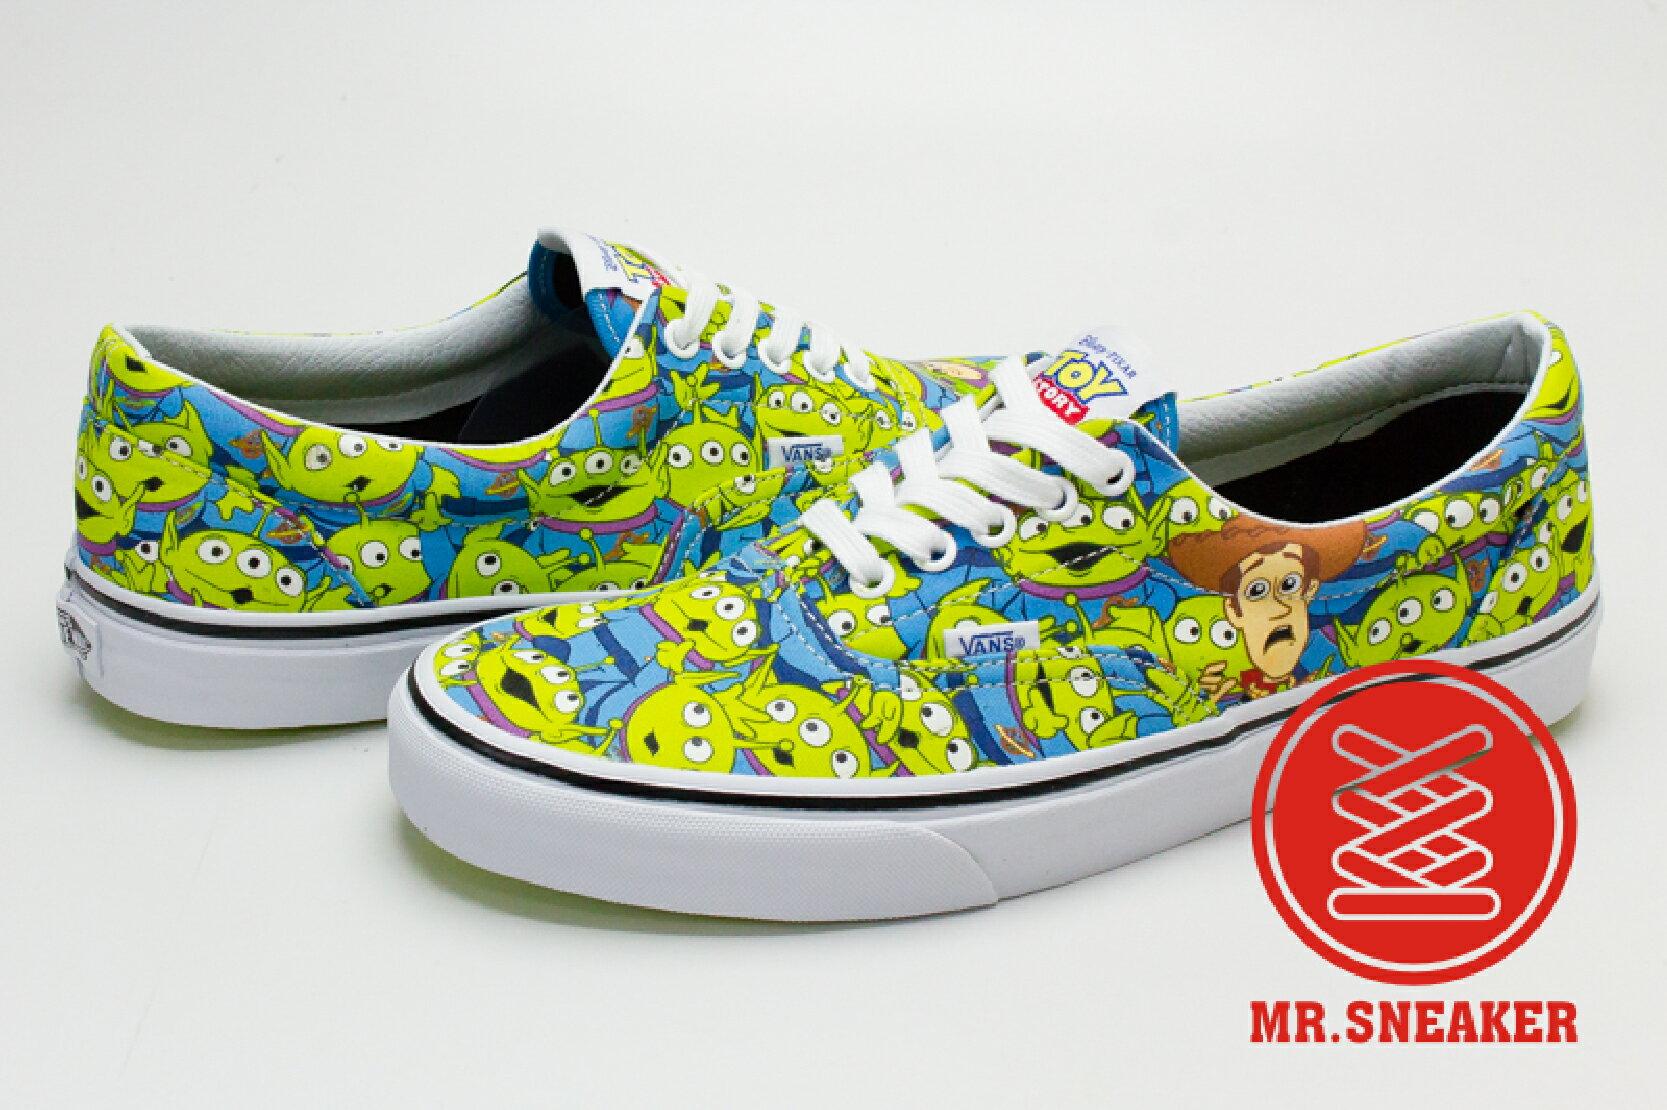 ☆Mr.Sneaker☆ VANS x Toy Story Era 玩具總動員 Aliens 三眼怪 夜光 綠 男女款